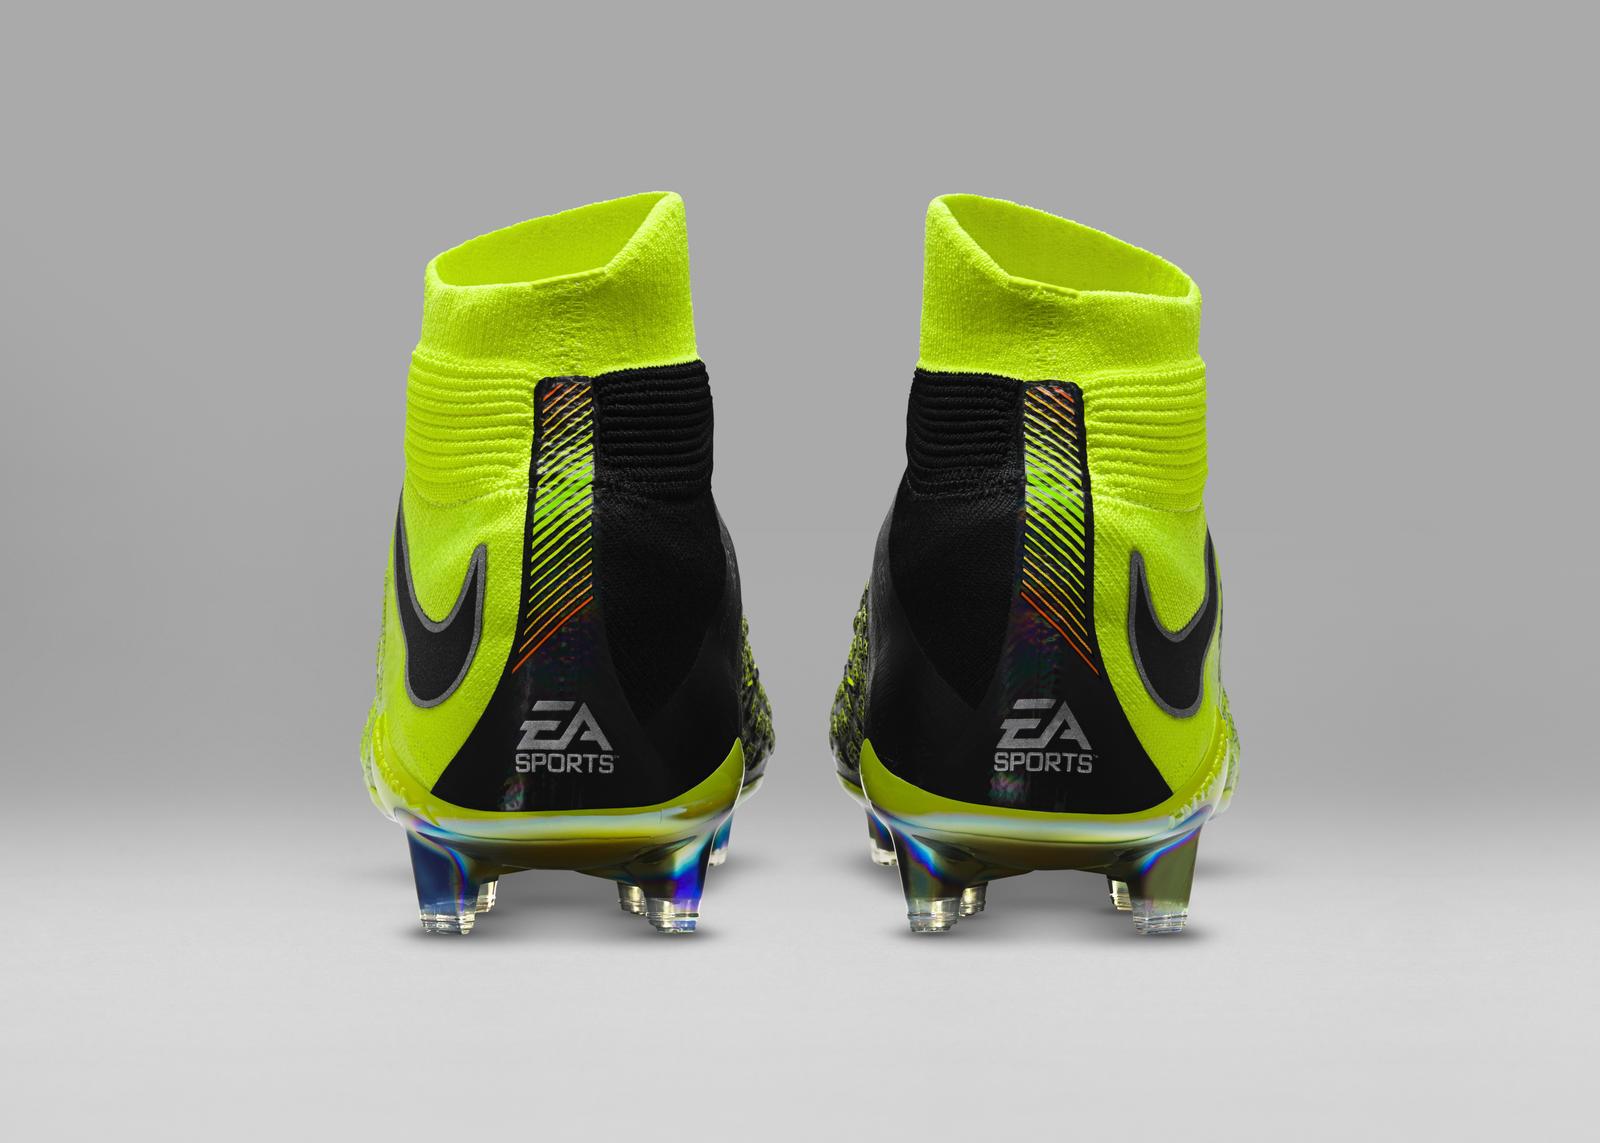 Nike x EA Sports Hypervenom 3 - Nike News